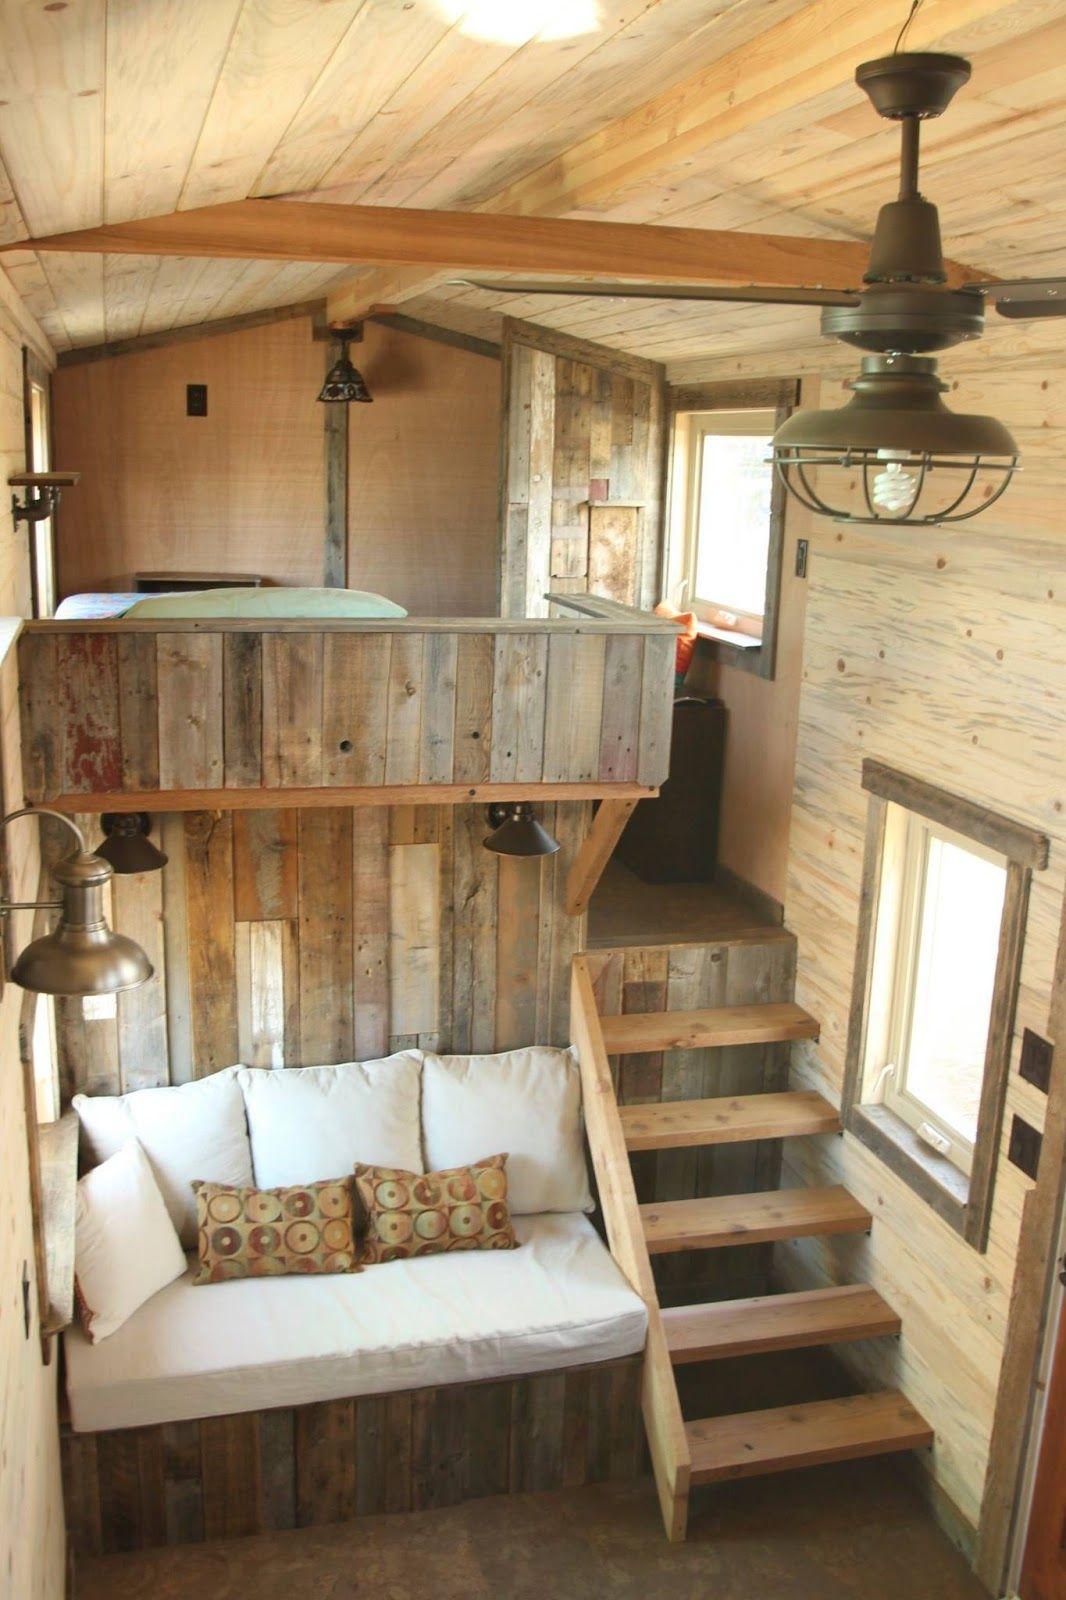 5 tiny house designs 2019 plan designs around the world on best tiny house plan design ideas id=44221